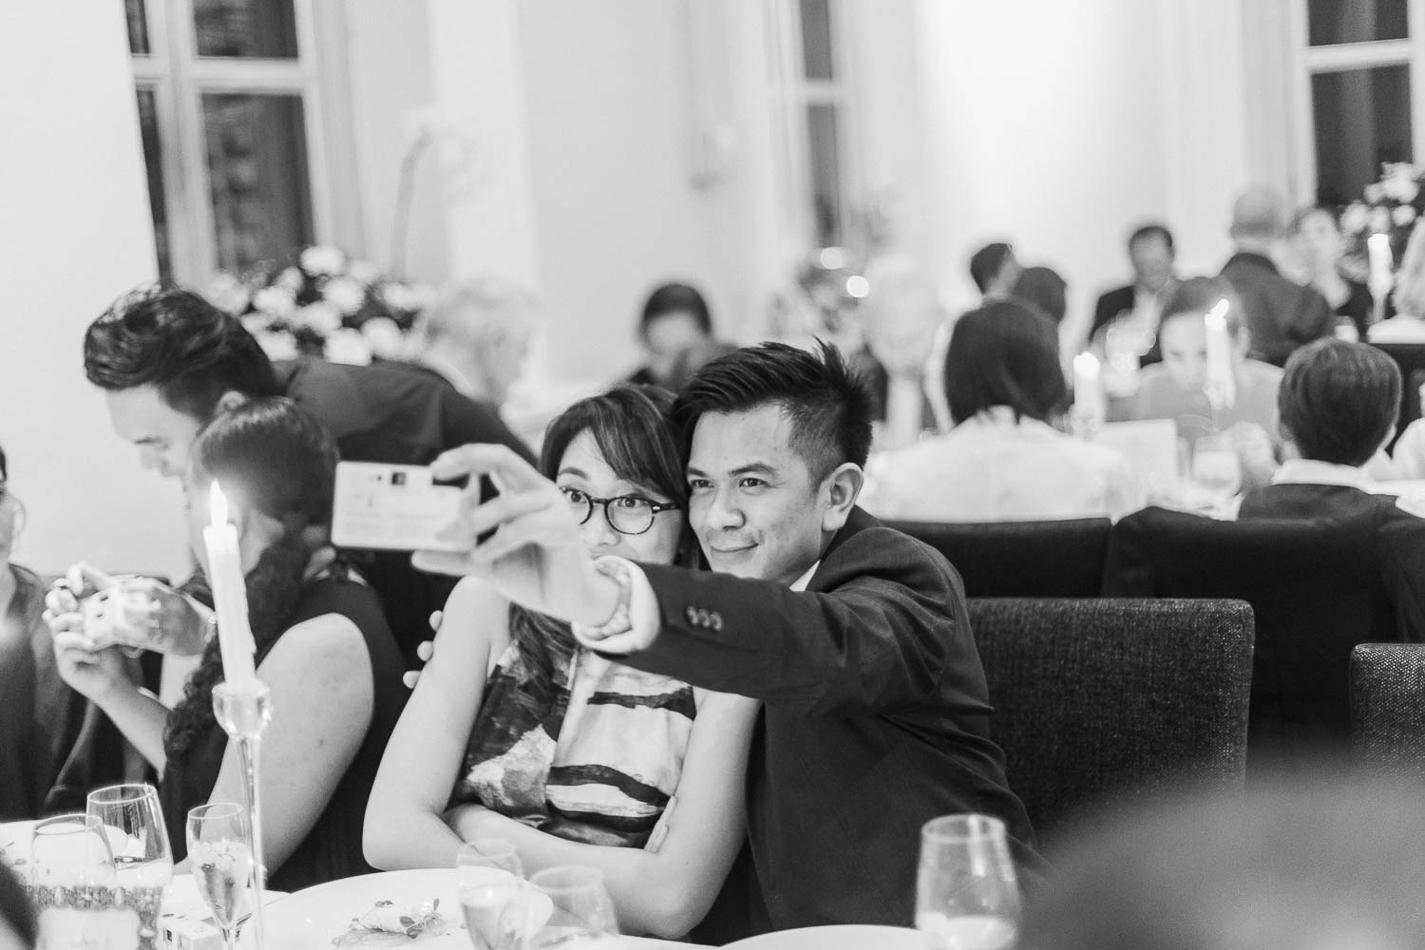 wedding-photographer-singapore-film-photographer-chen-sands-Anglea-wedding-CSPBLOG-22.jpg